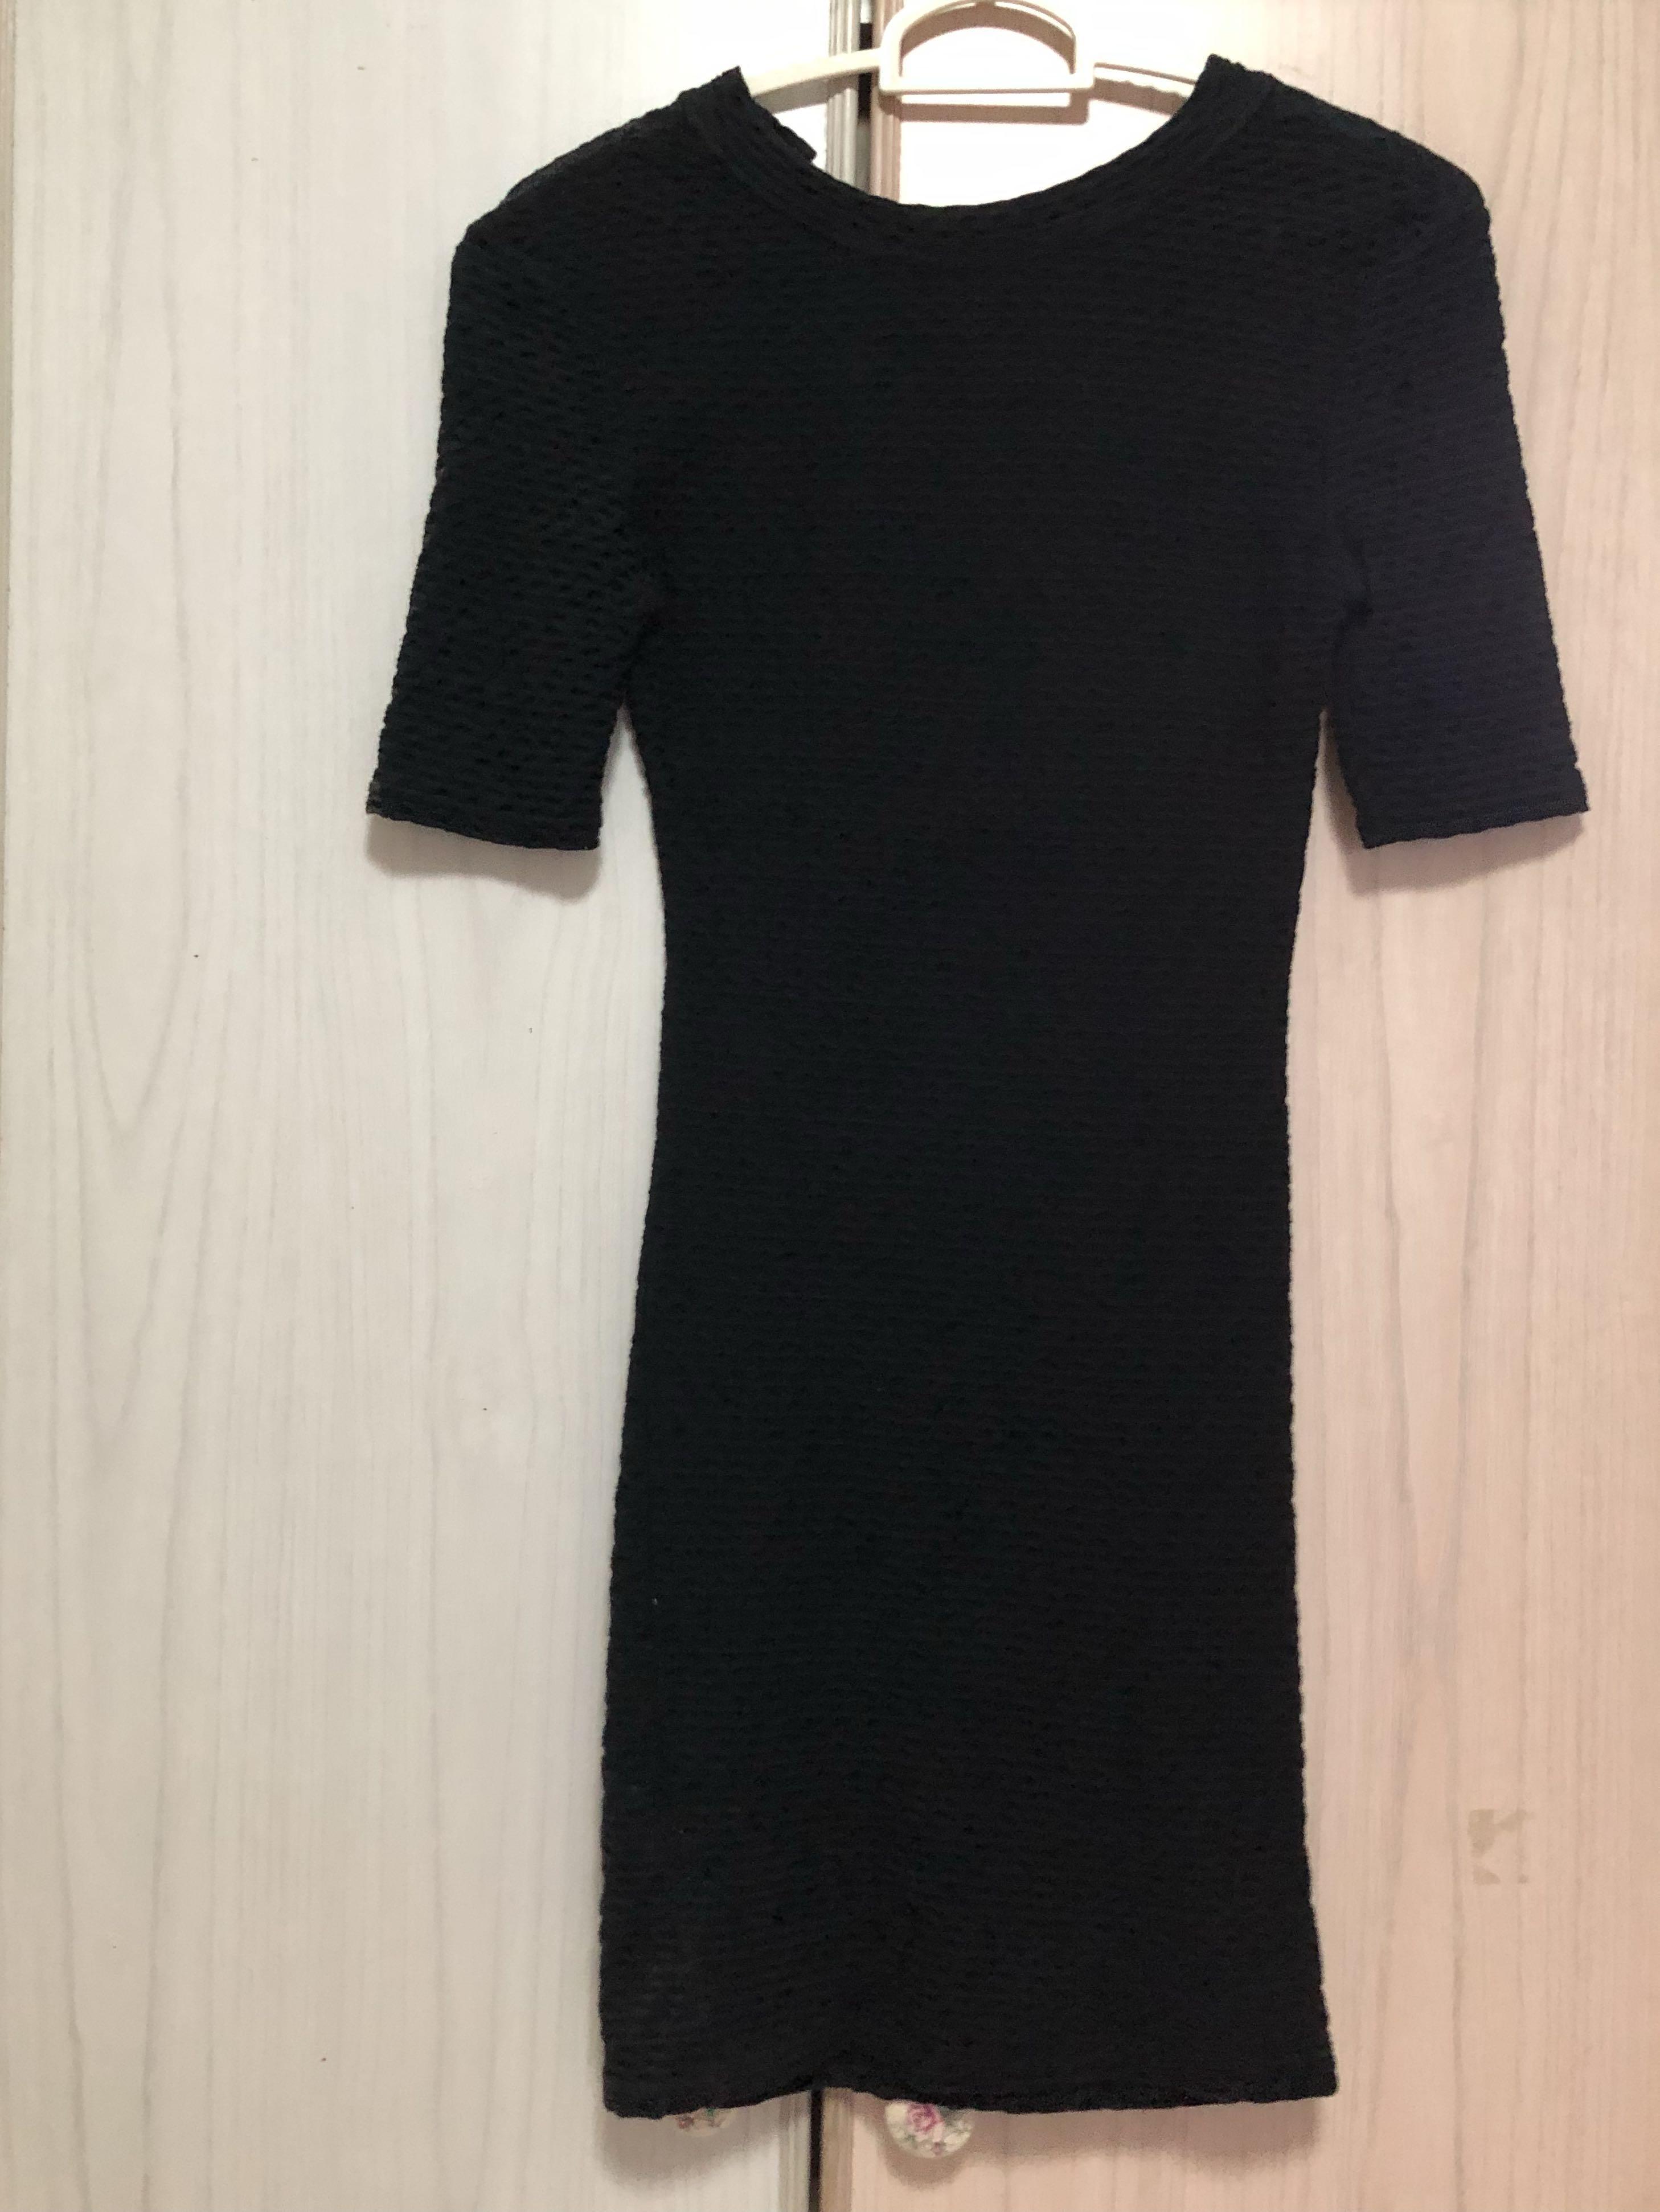 Green UK8//EU36//US4 Topshop Sequin Velvet Shift Mini Dress